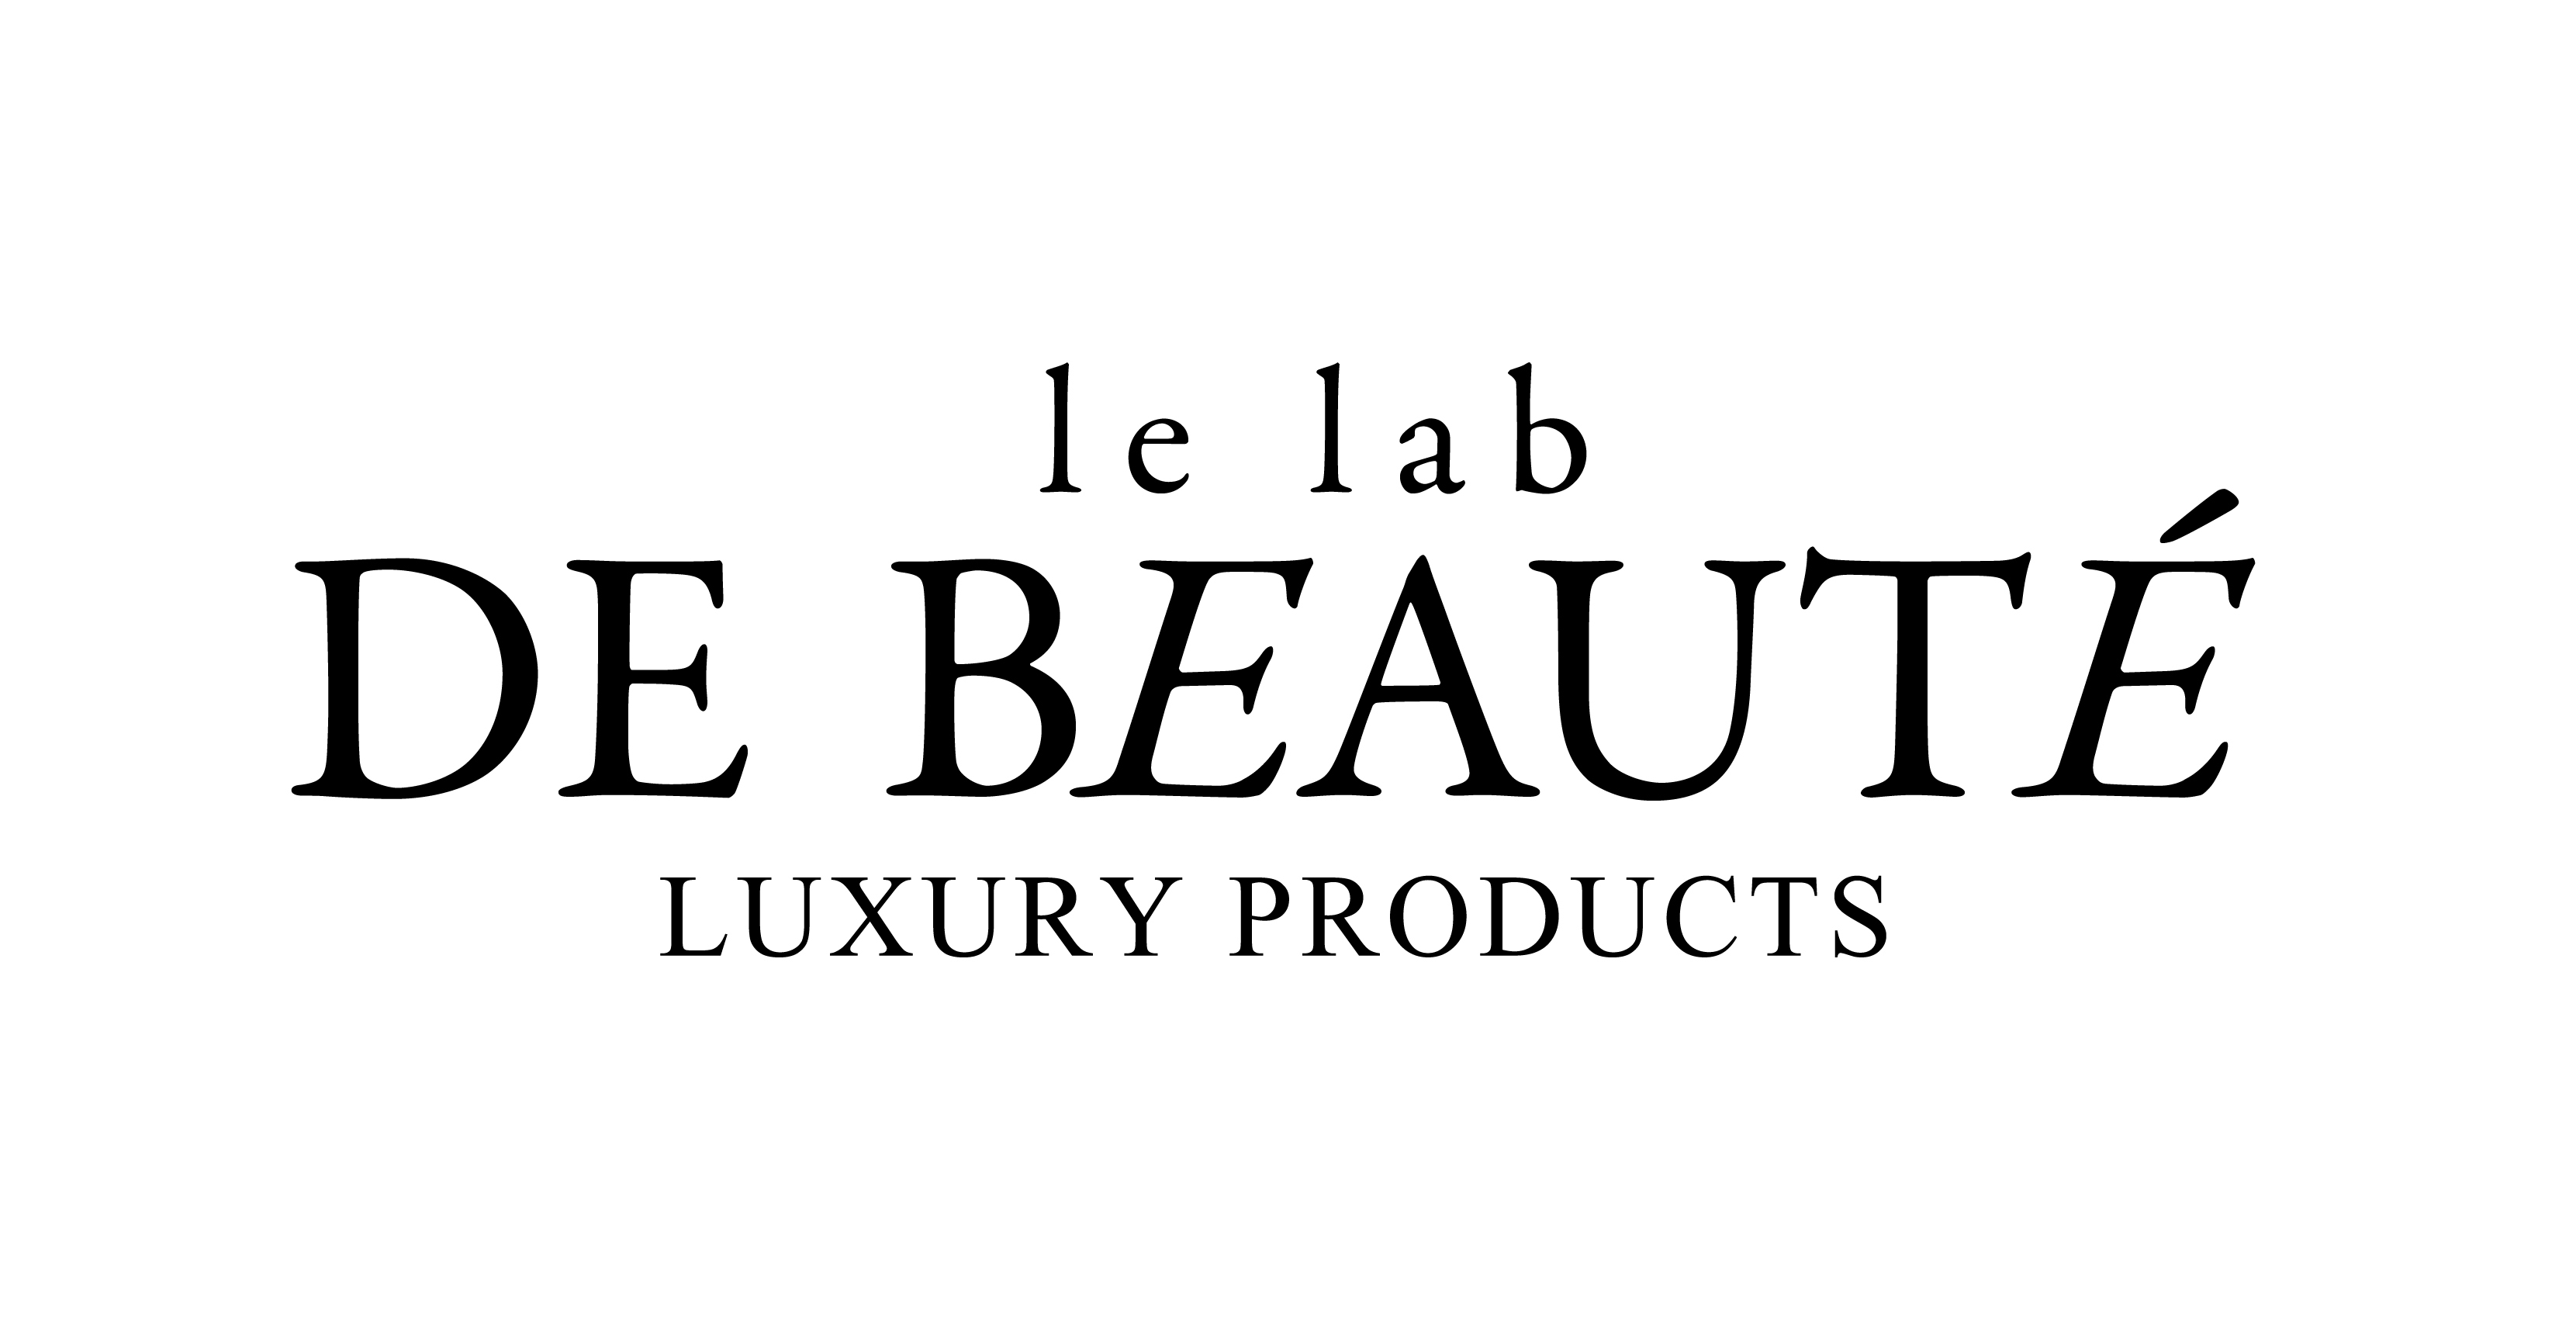 LeLabdeBeaute logo_DASIL 2018